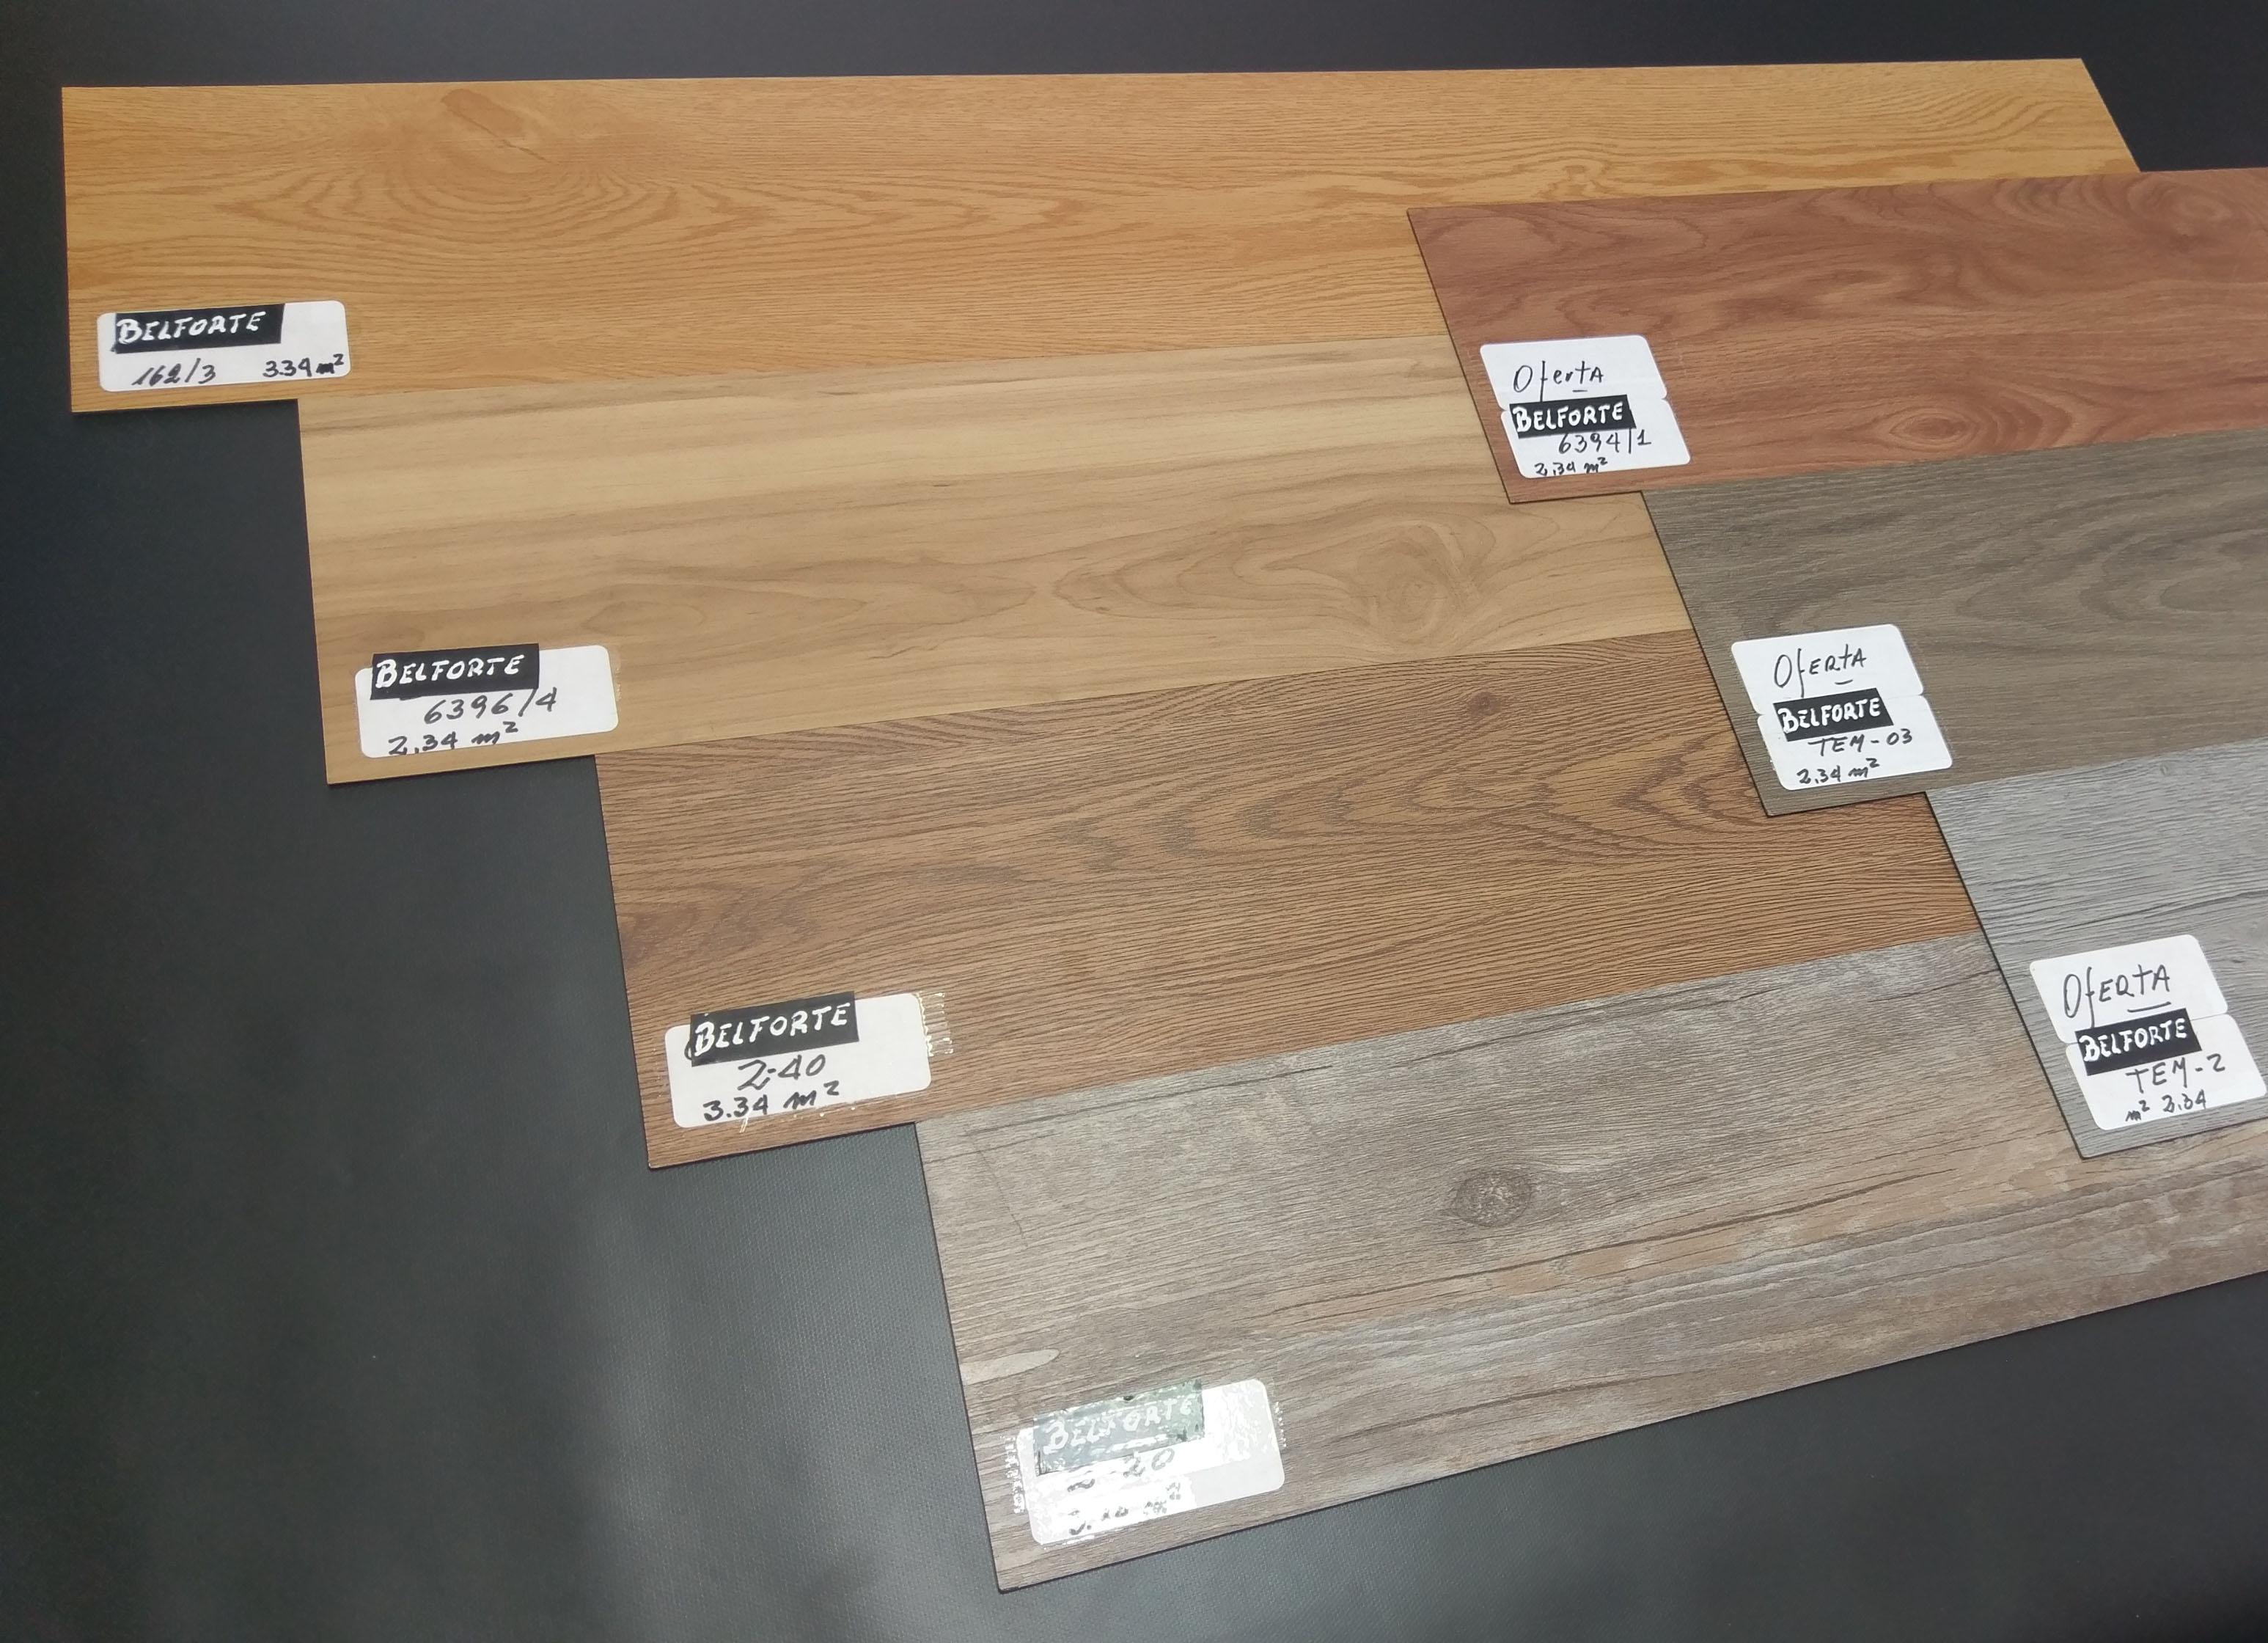 Fotos de piso vinilico piso vinlico con acabado de madera - Pegamento para parquet ...